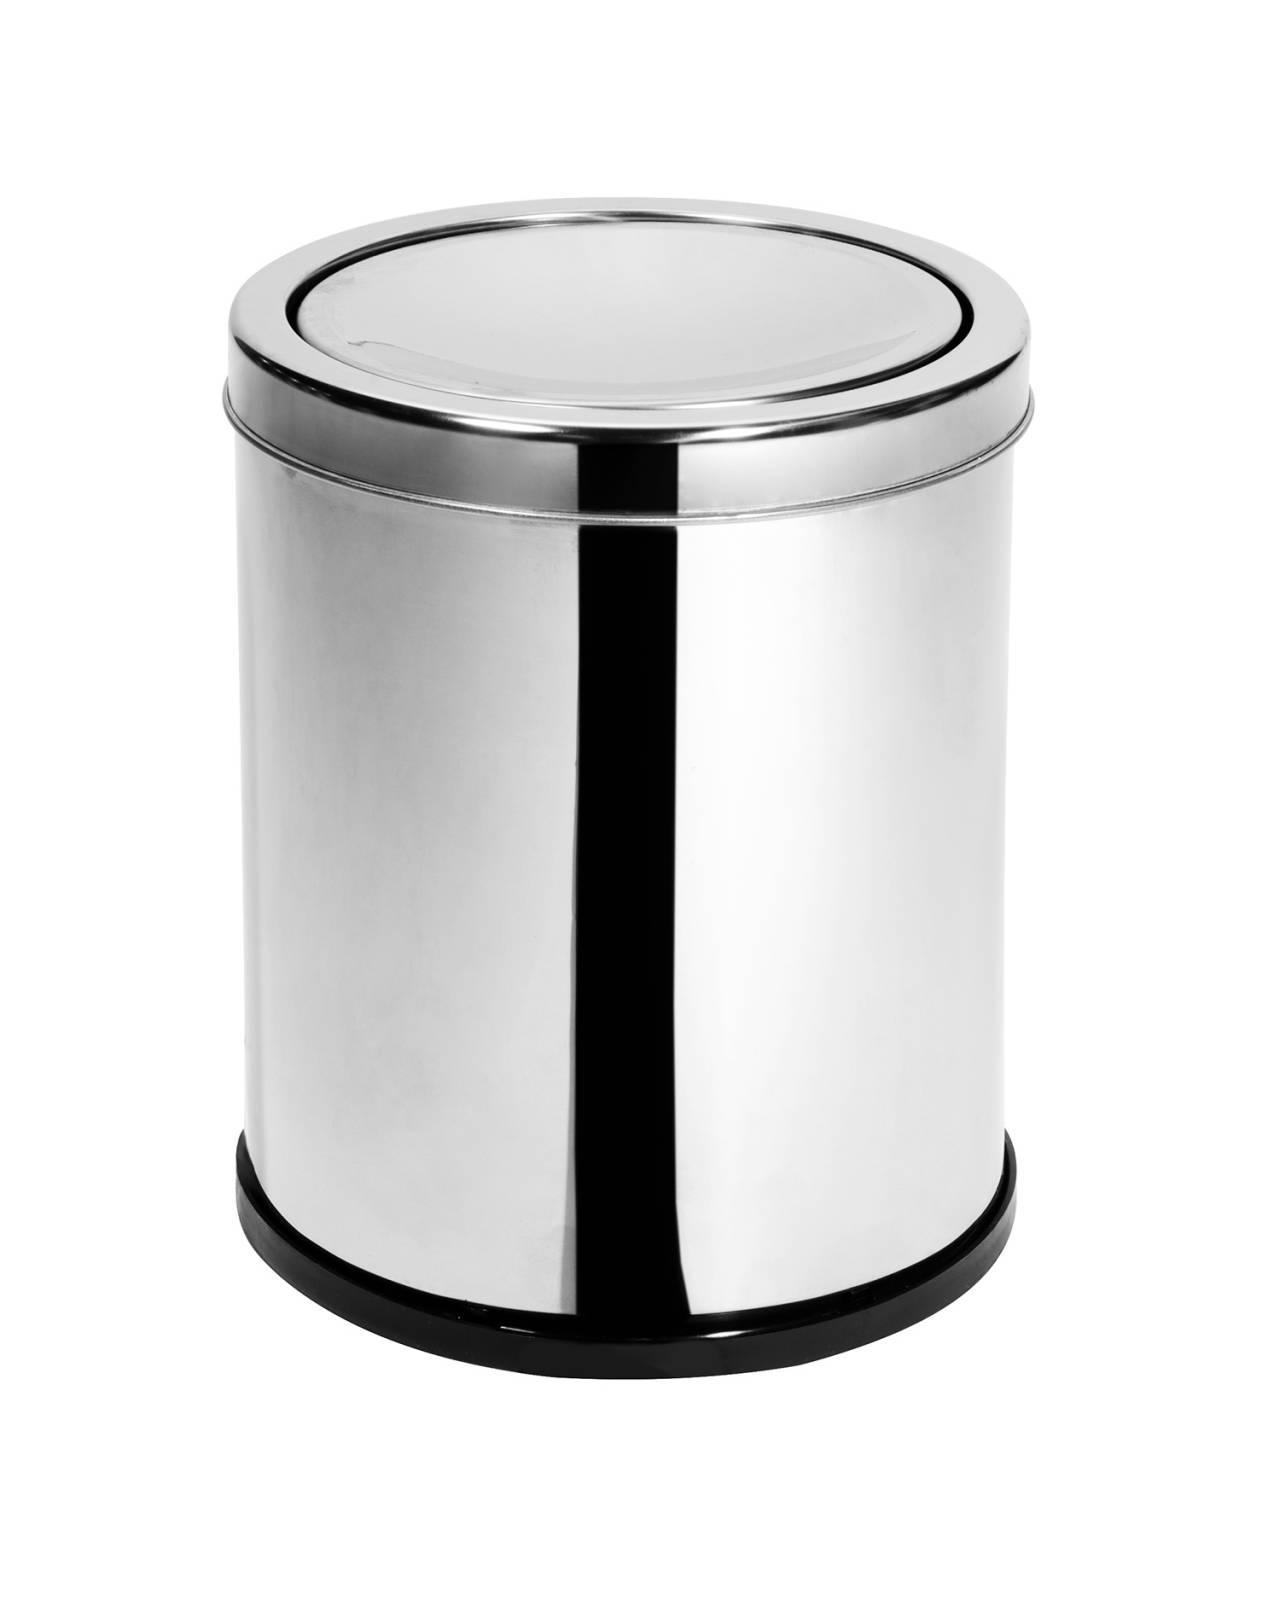 Lixeira Inox c/ tampa Basculante 6,9 Litros - Elegance